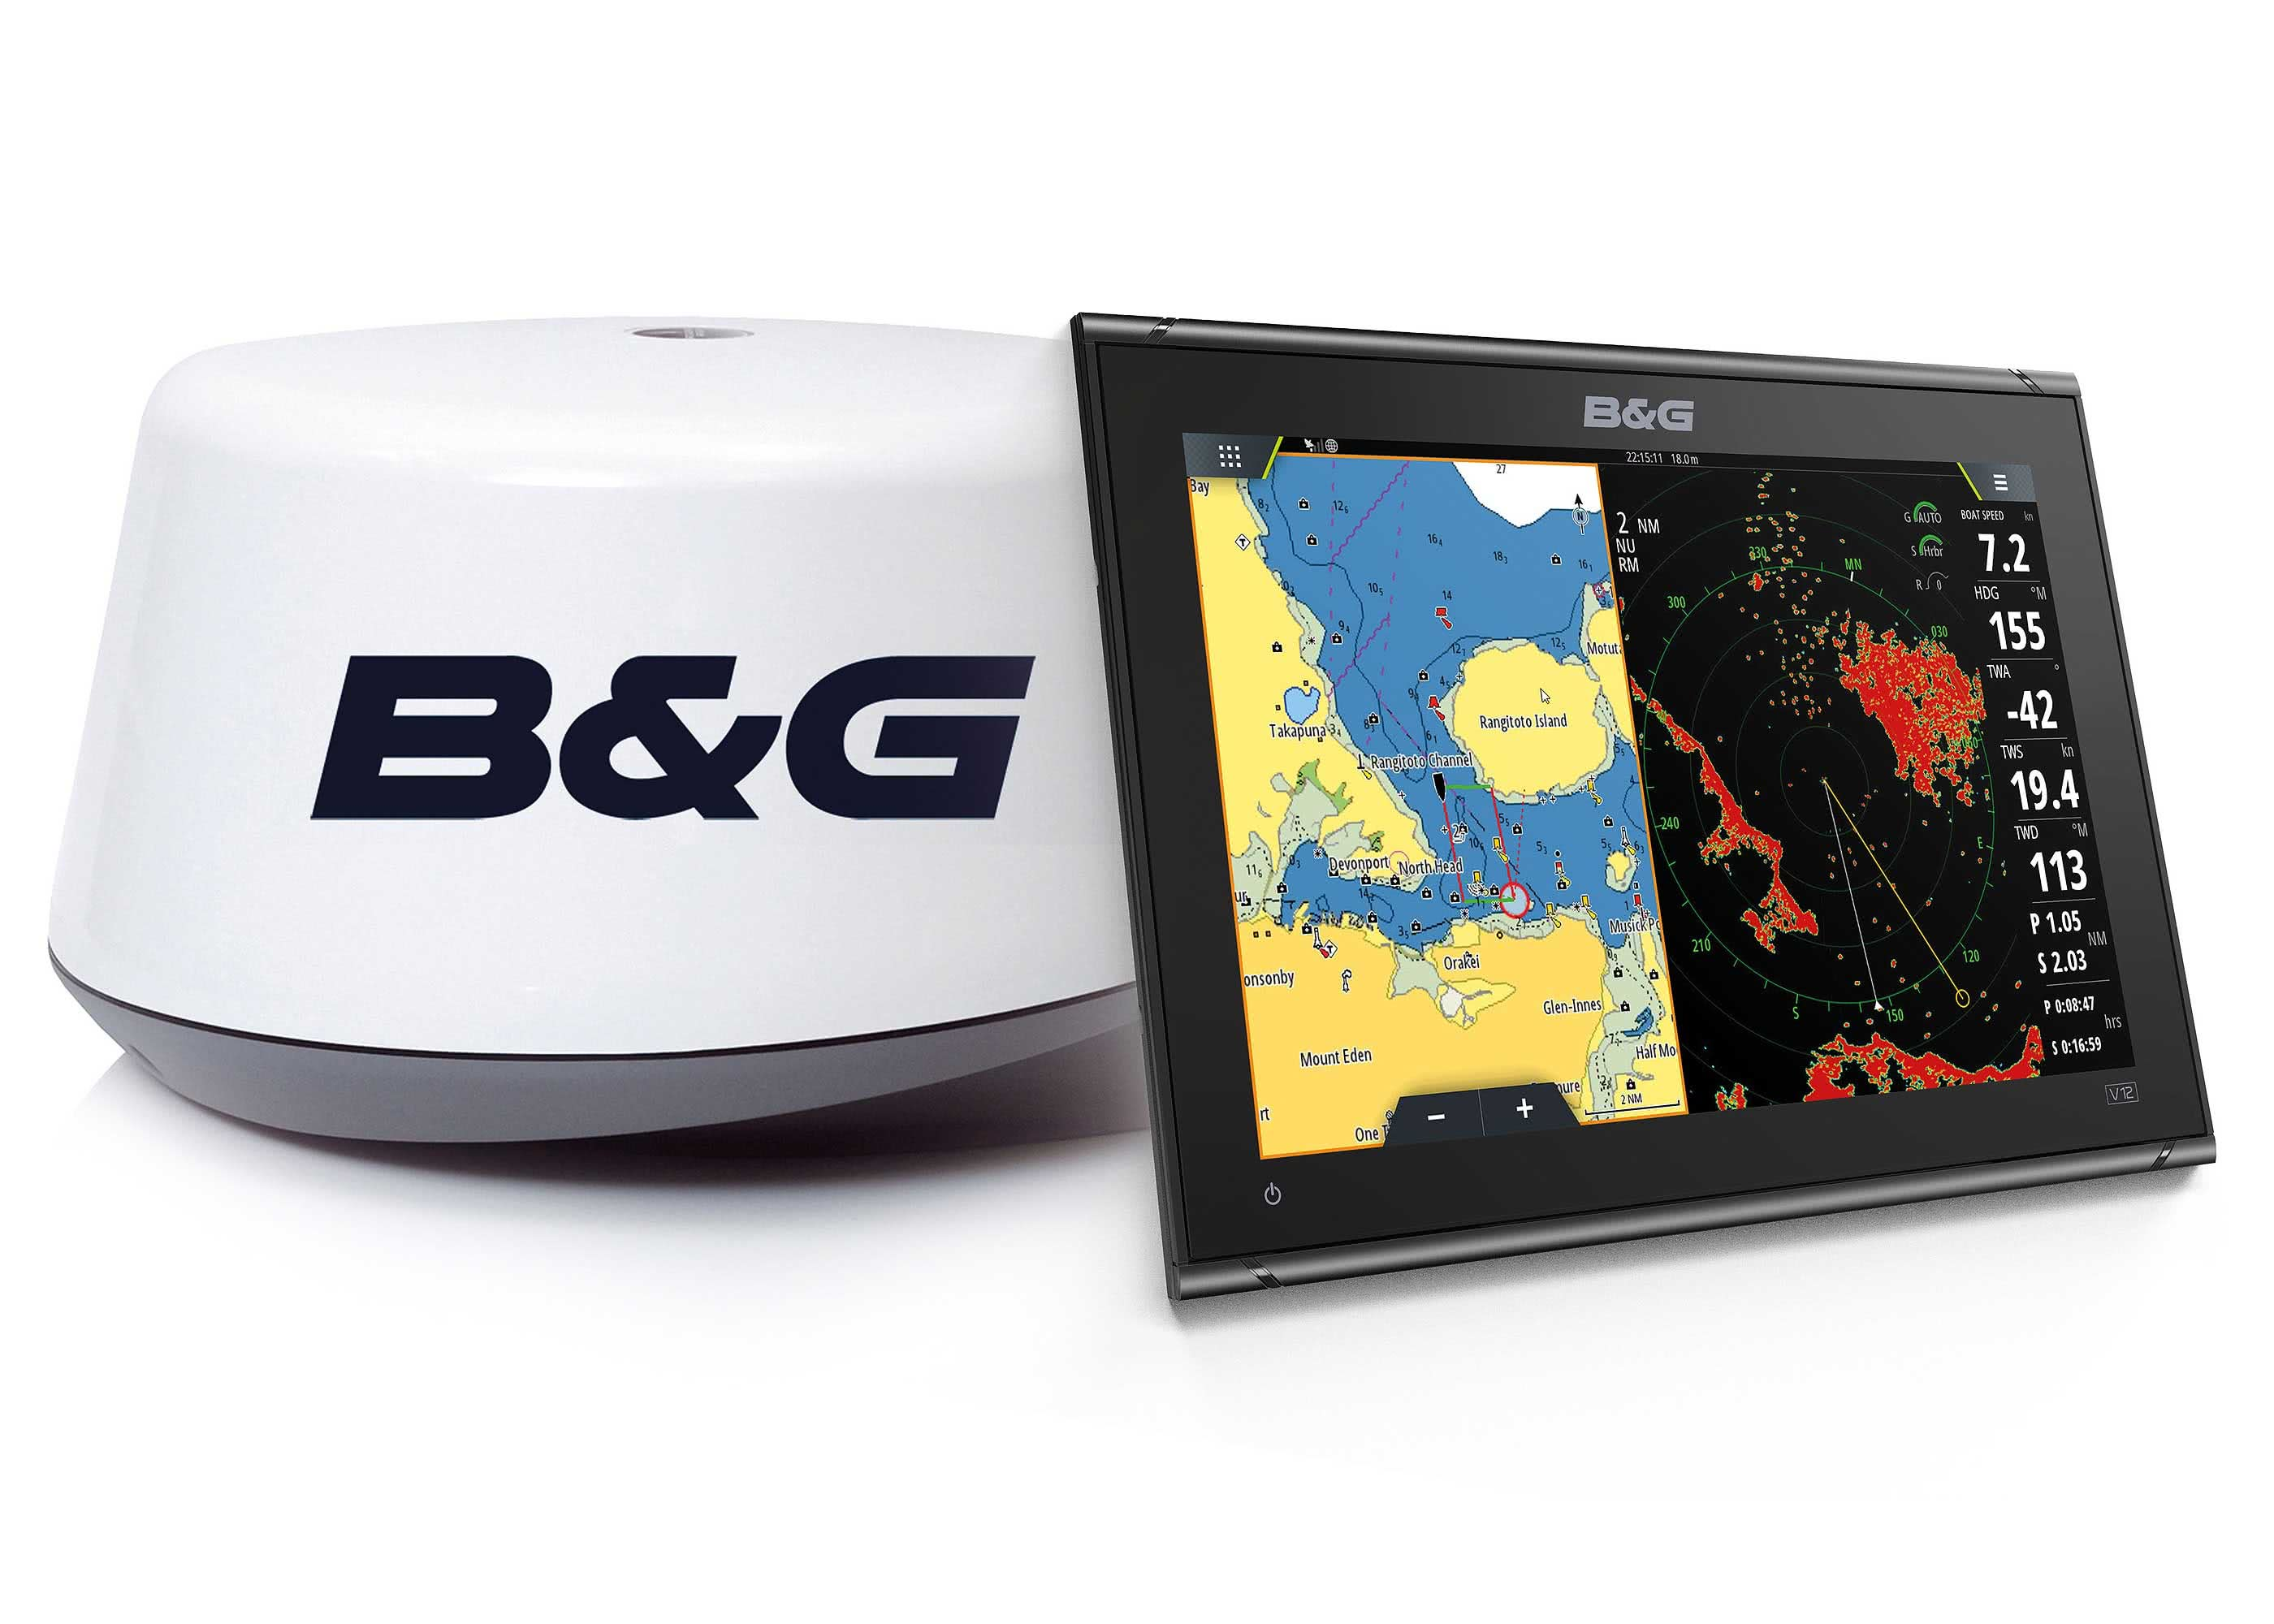 81644_B&G_Vulcan12_mit-3G-Radarantenne.jpg